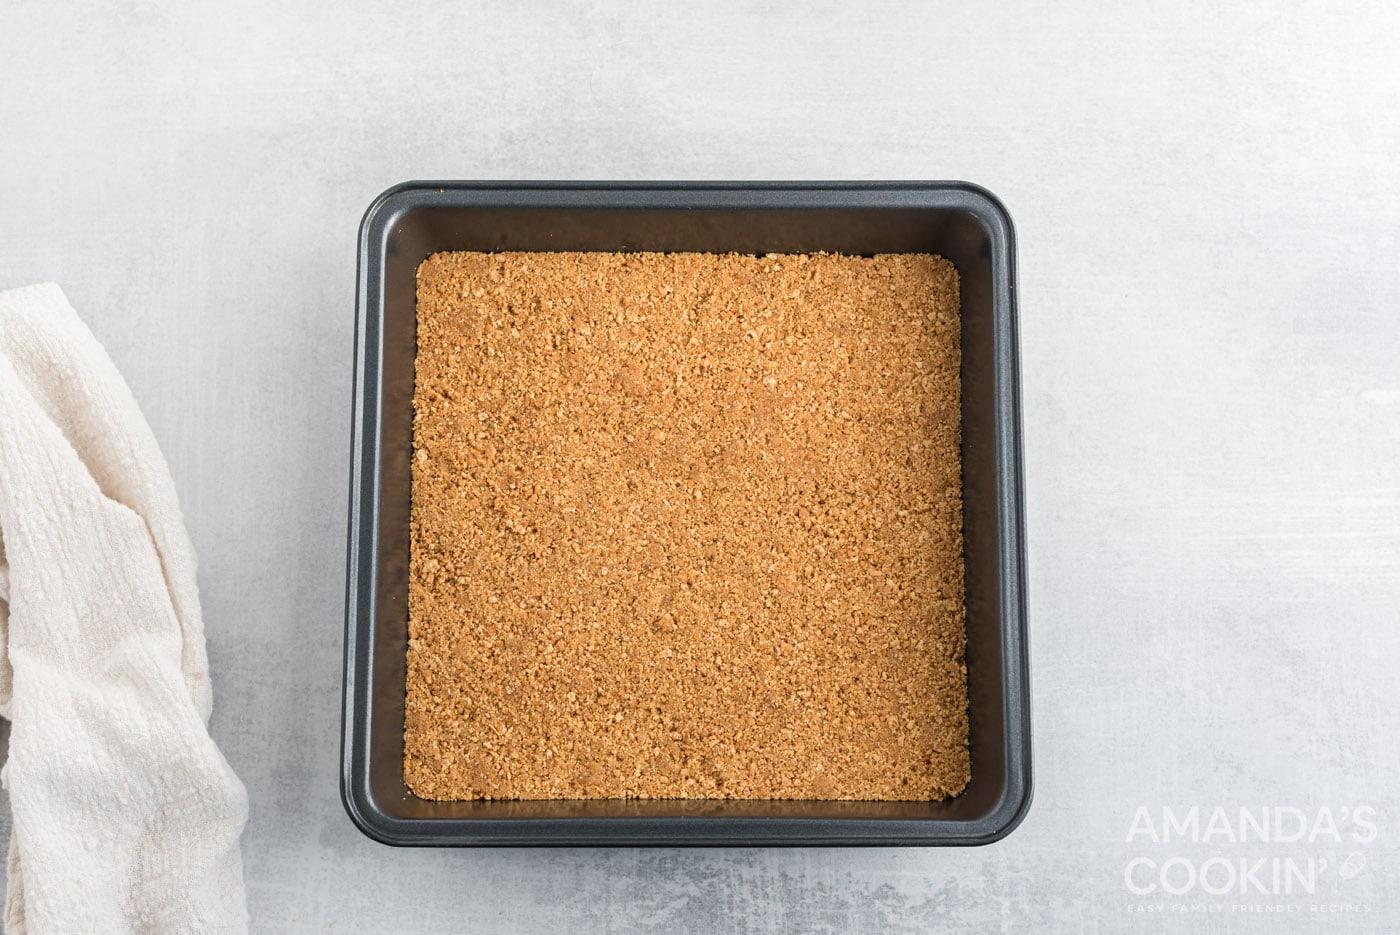 crumb crust in pan